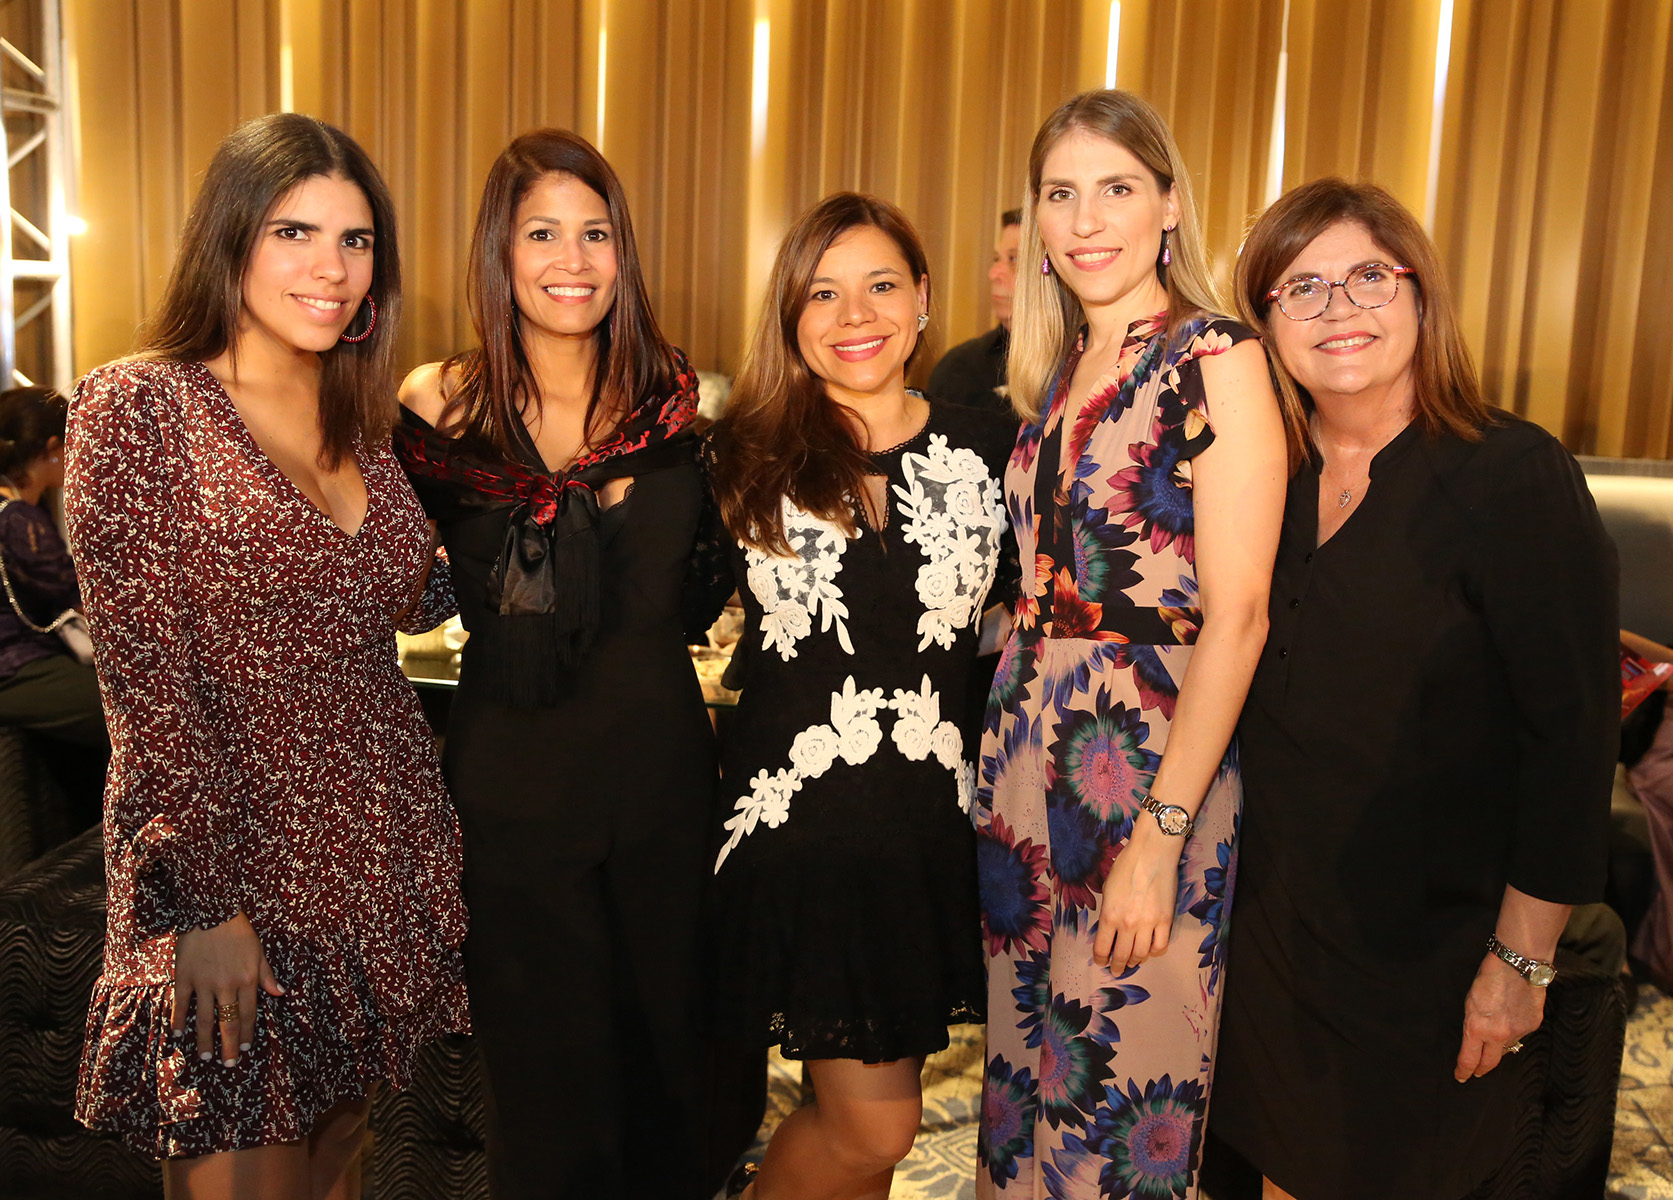 Natalia Abreu, Carol Santana, Martha Buitrago, Alicia Reyes y Maritza Soto.  (José R. Pérez Centeno)